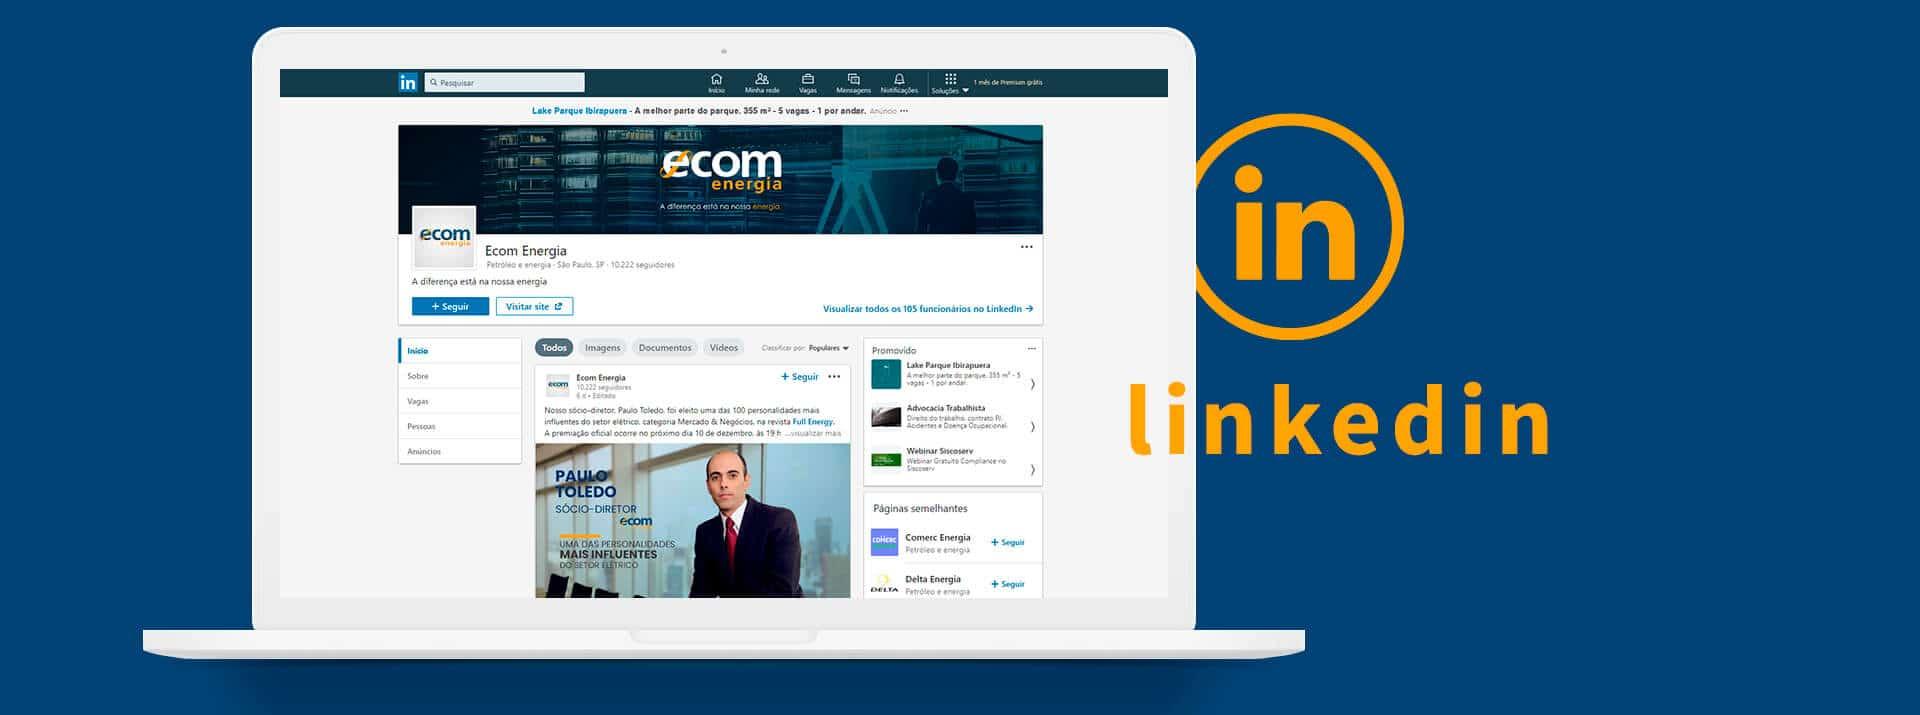 linkedin-de-ecom-energia